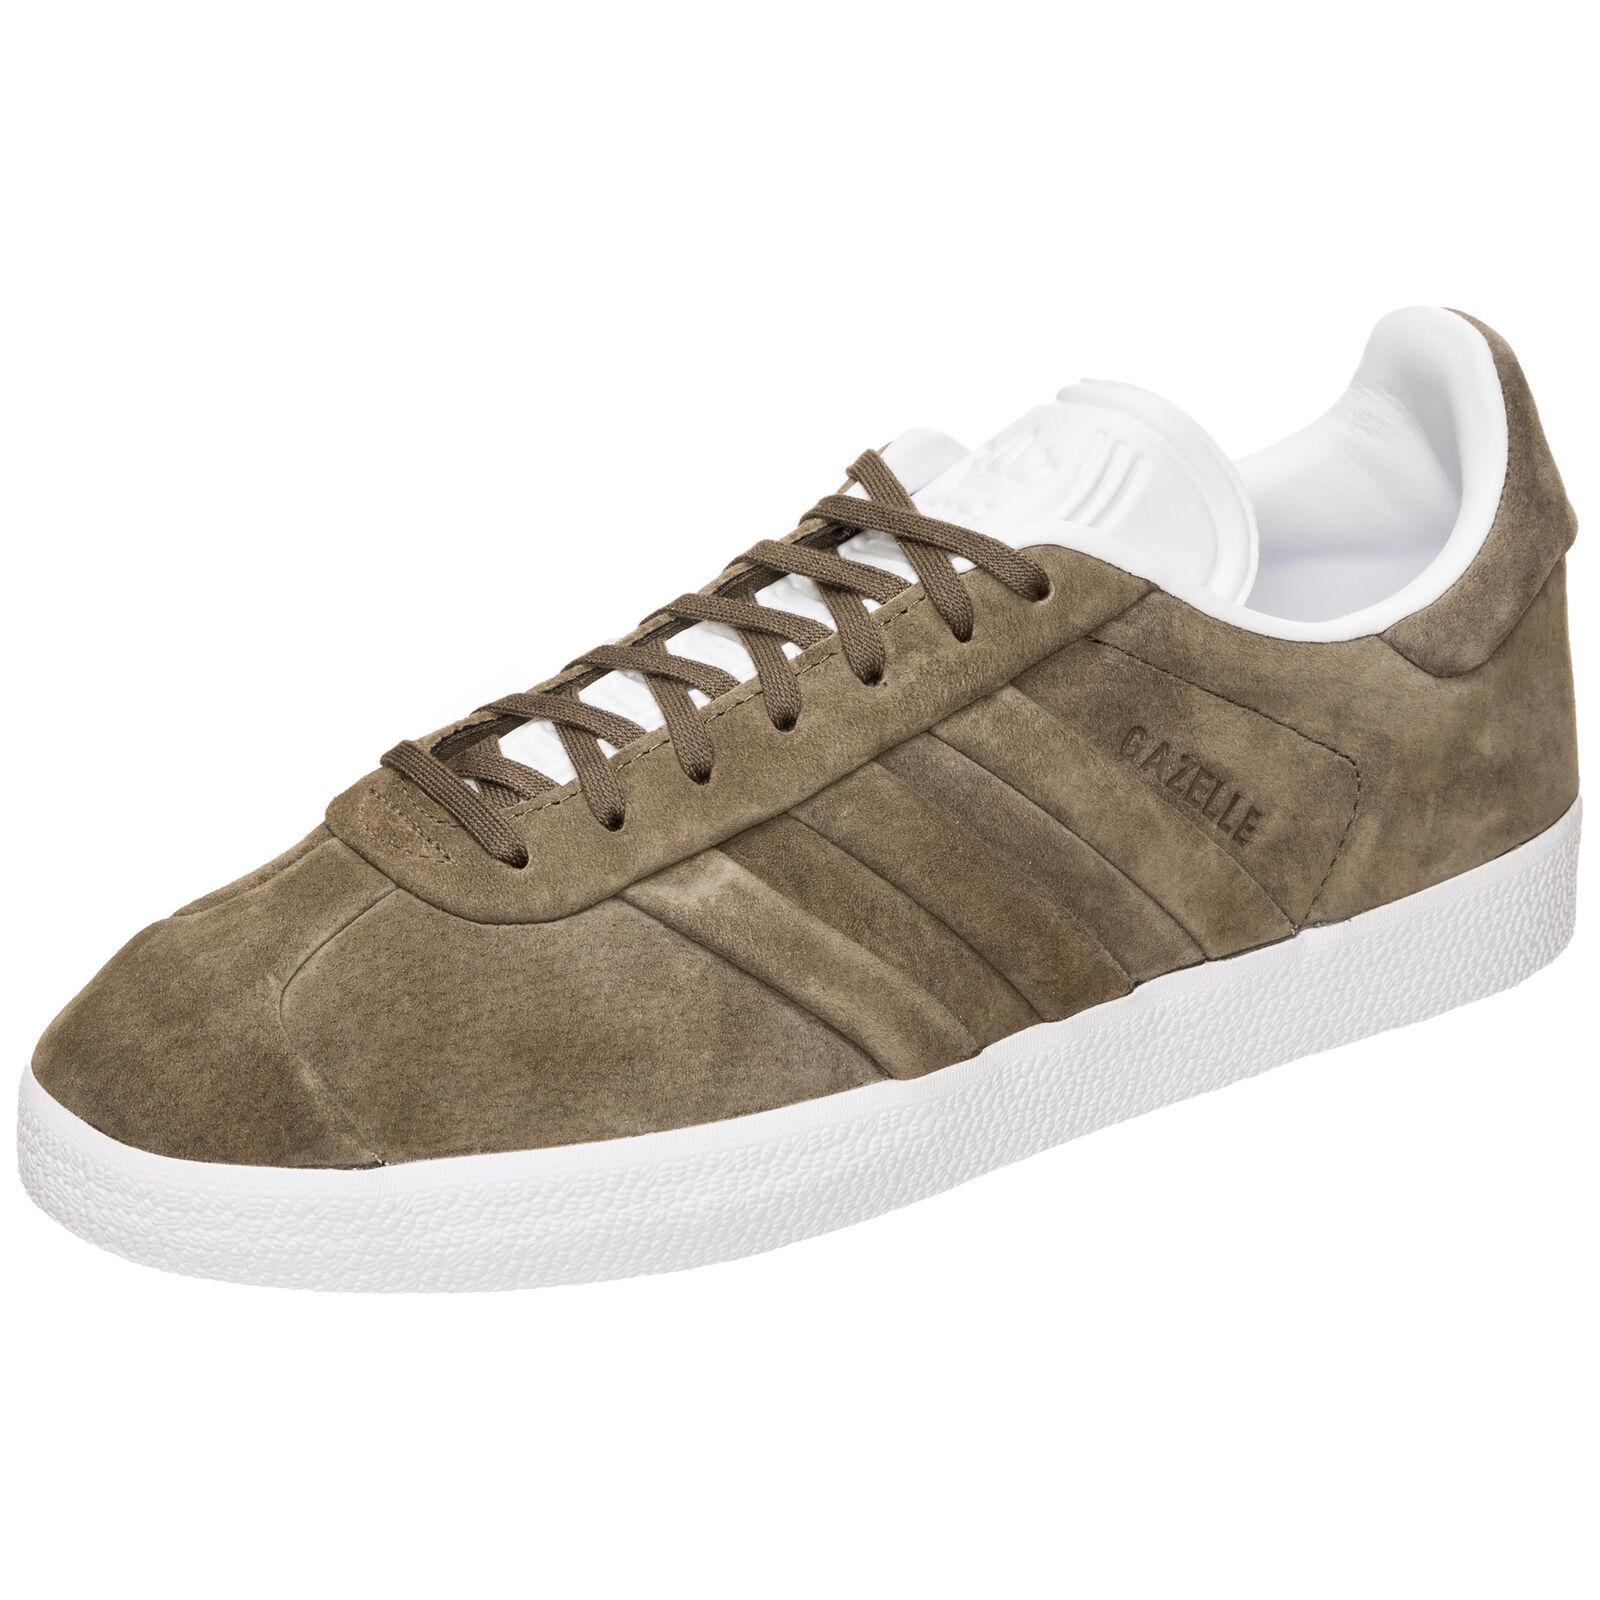 adidas Originals Gazelle Stitch and Turn Sneaker Grüntöne NEU Schuhe Turnschuhe